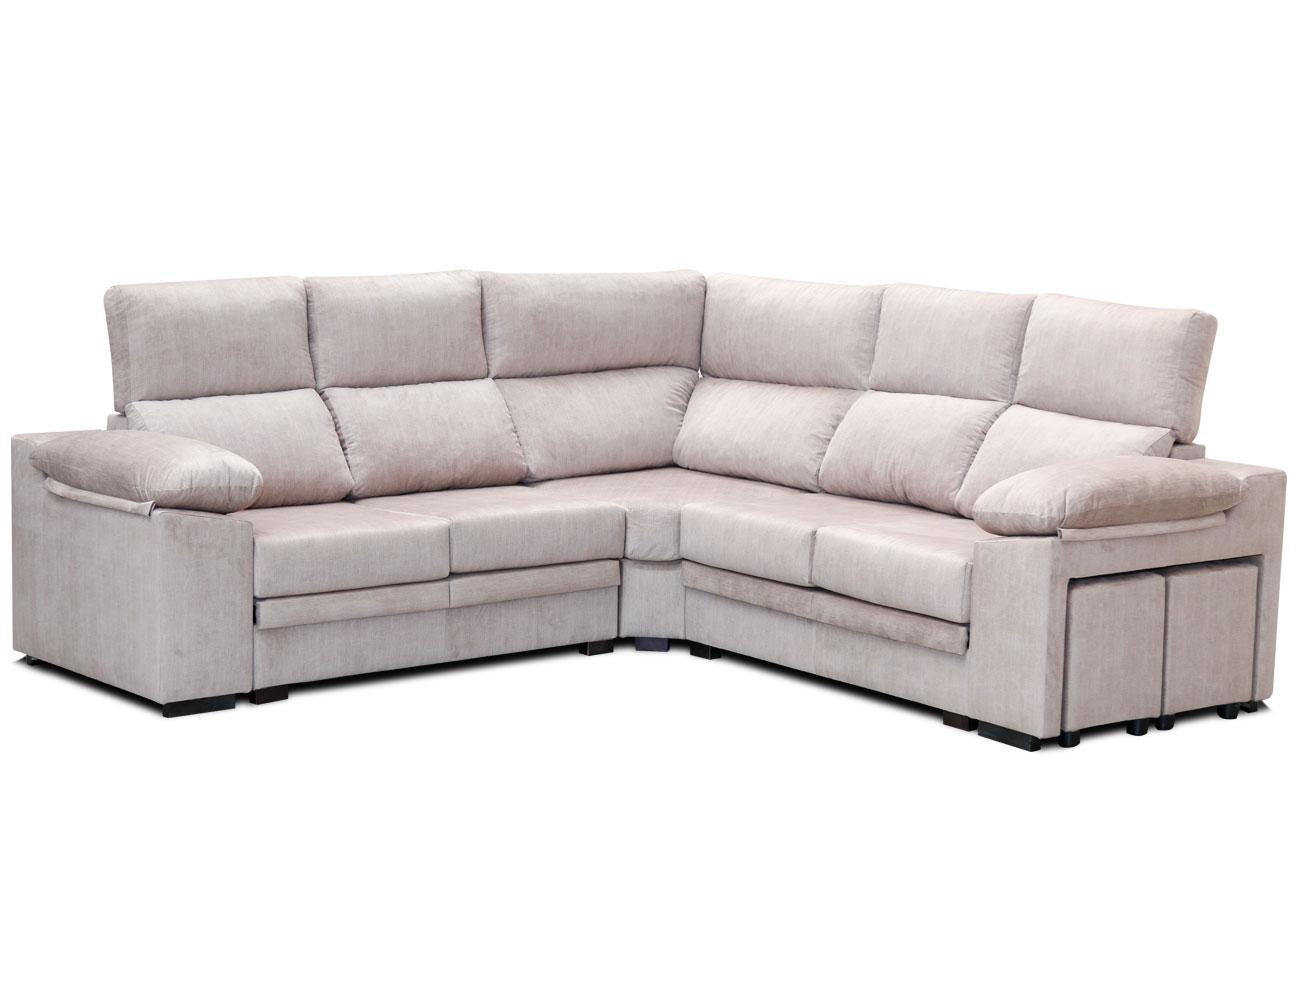 Sofa rincon rinconera beig pufs 2